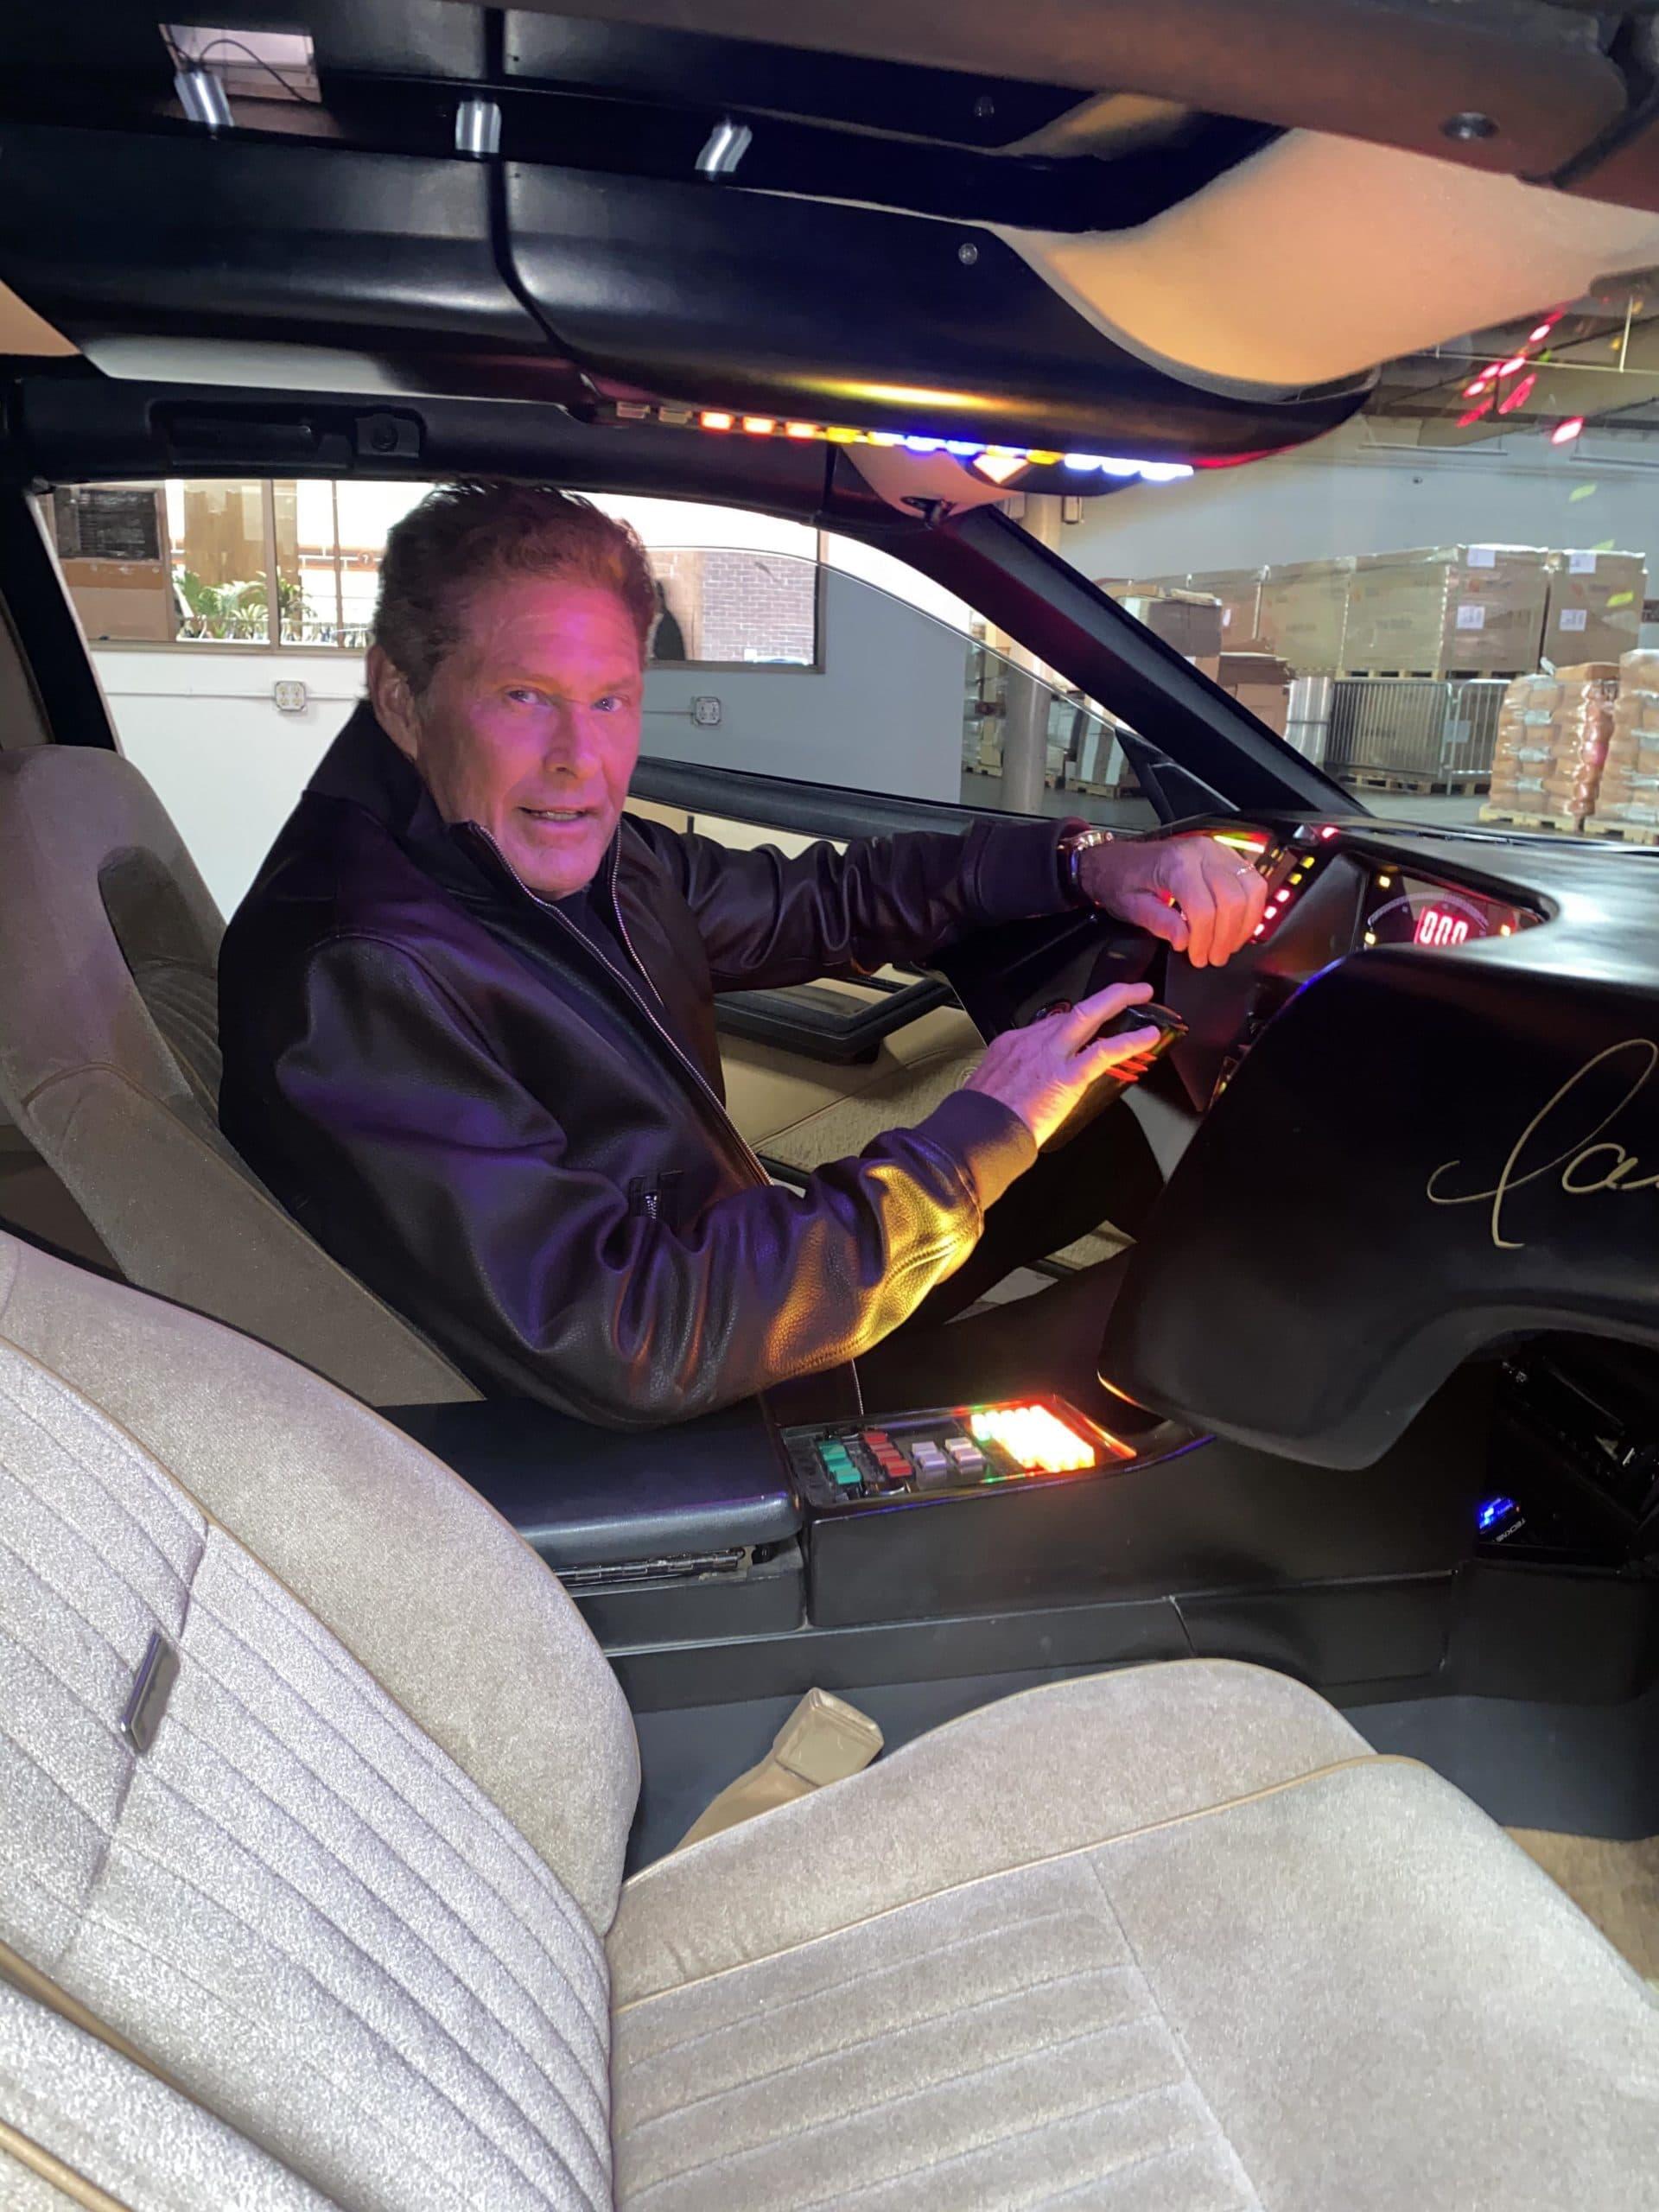 David Hasselhoff inside his personal KITT car from the original Knight Rider TV series